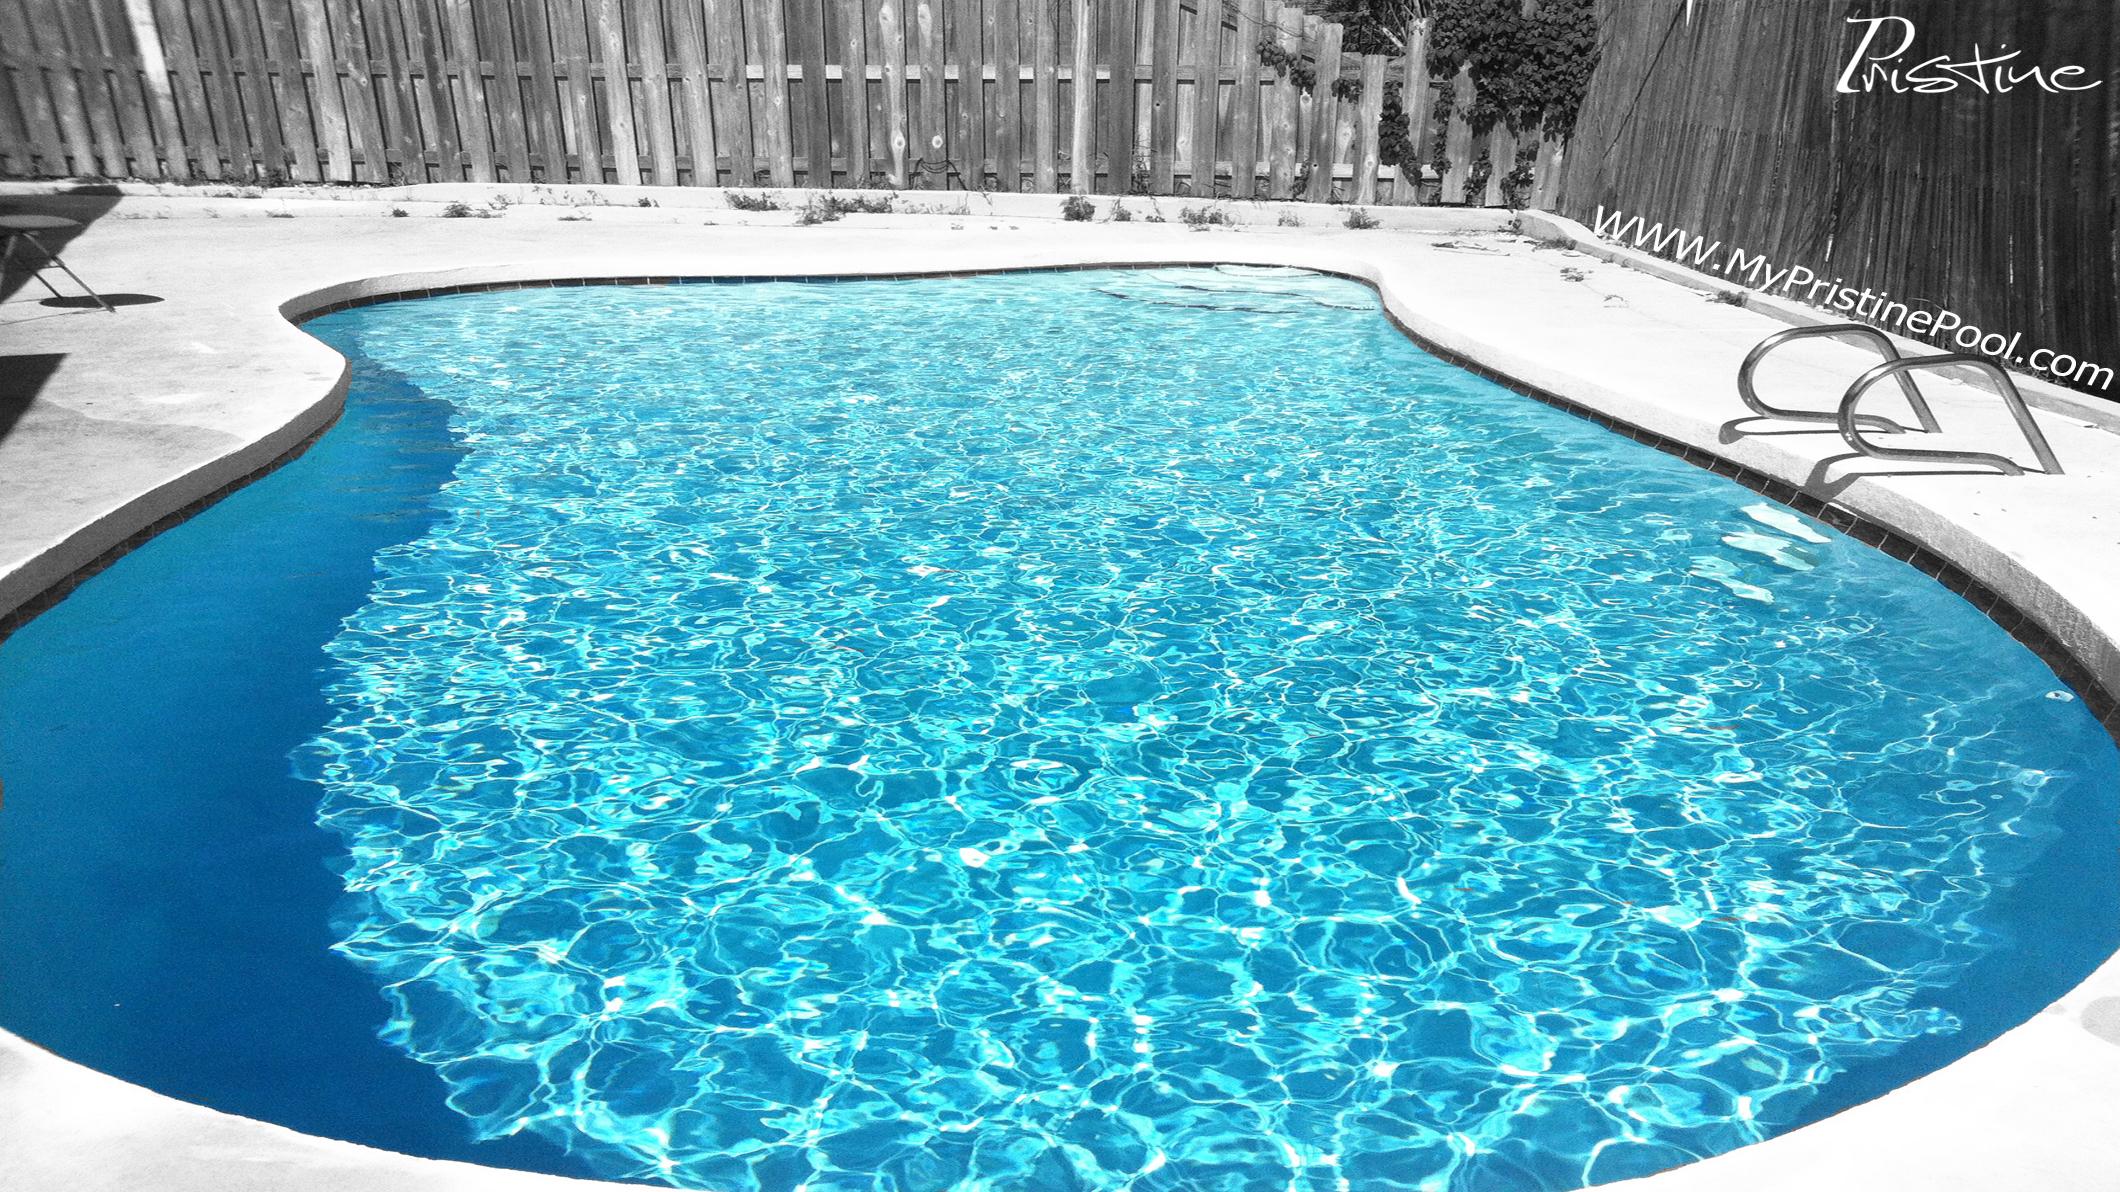 Swimming Pool Repair Service And Resurfacing Company